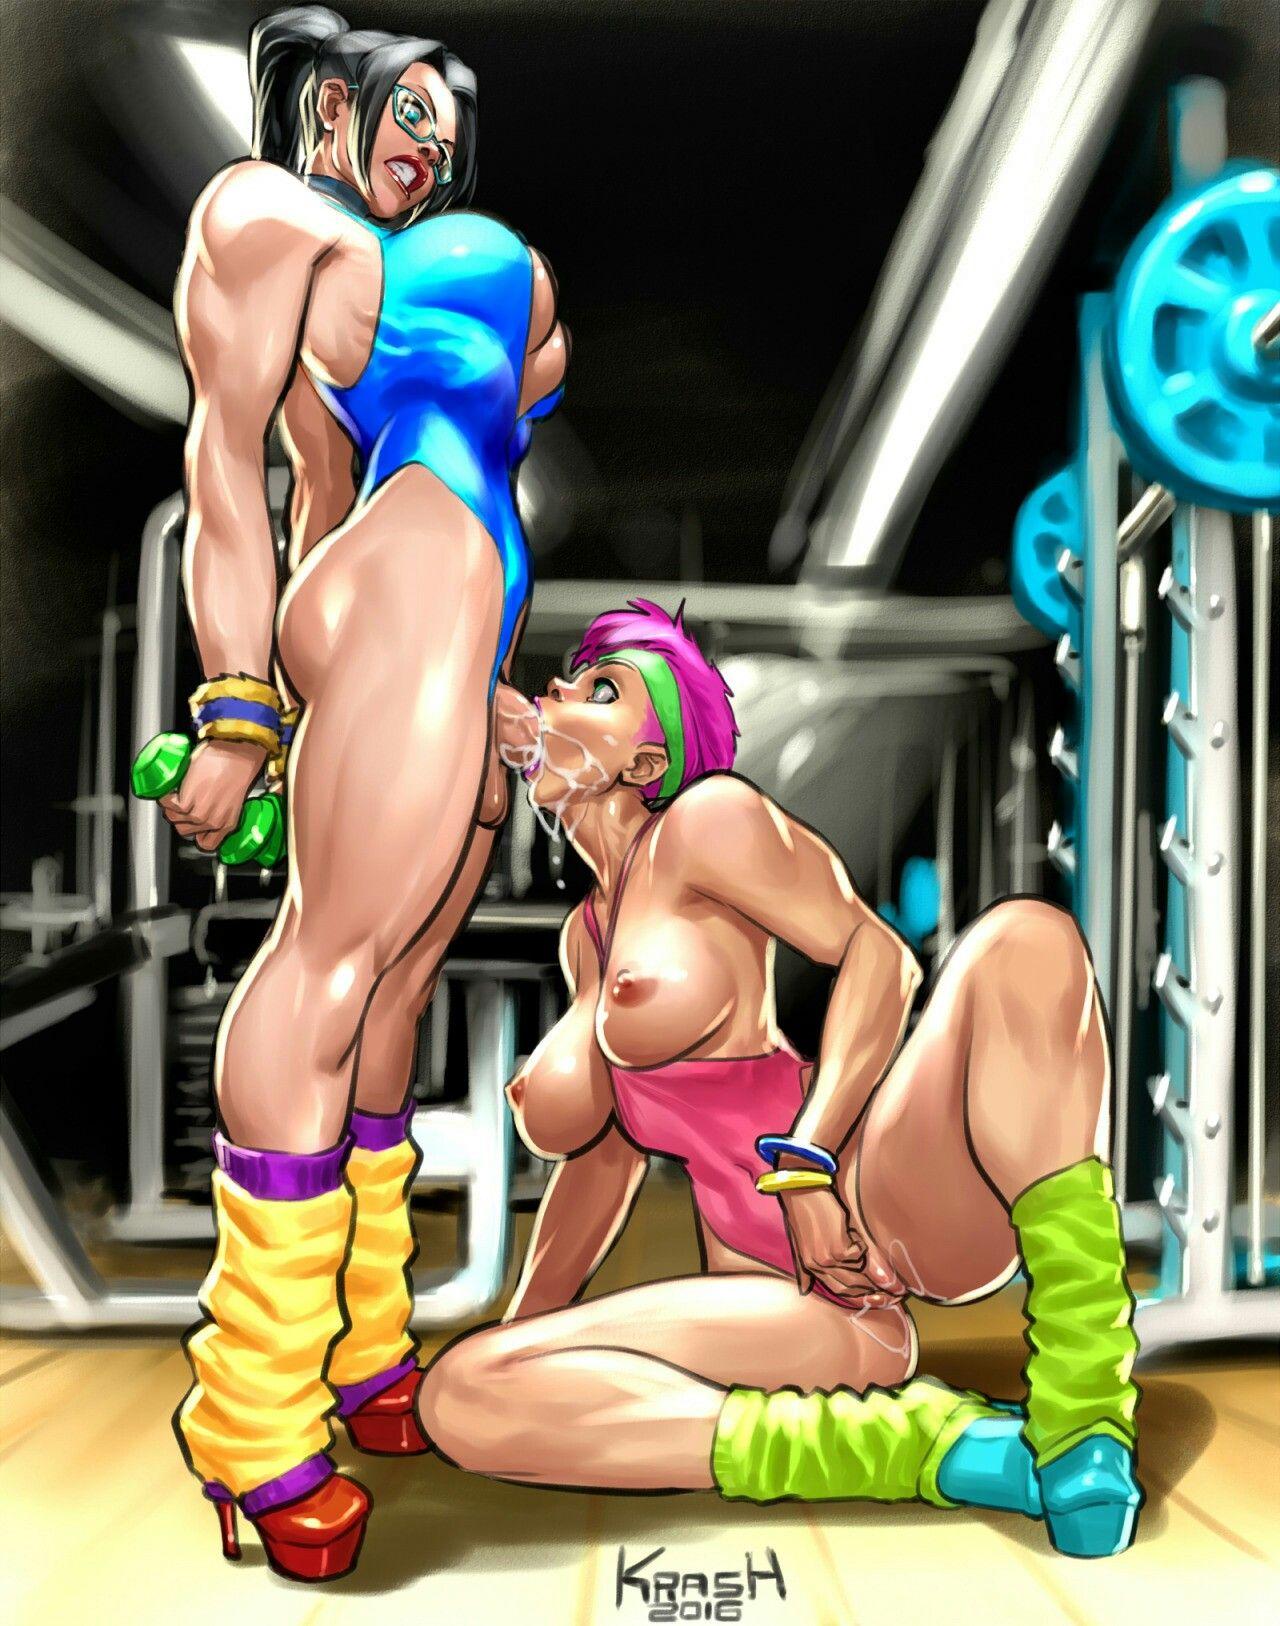 Hentai Of Cartoons for shemale hentai cartoon | hot | pinterest | cartoon